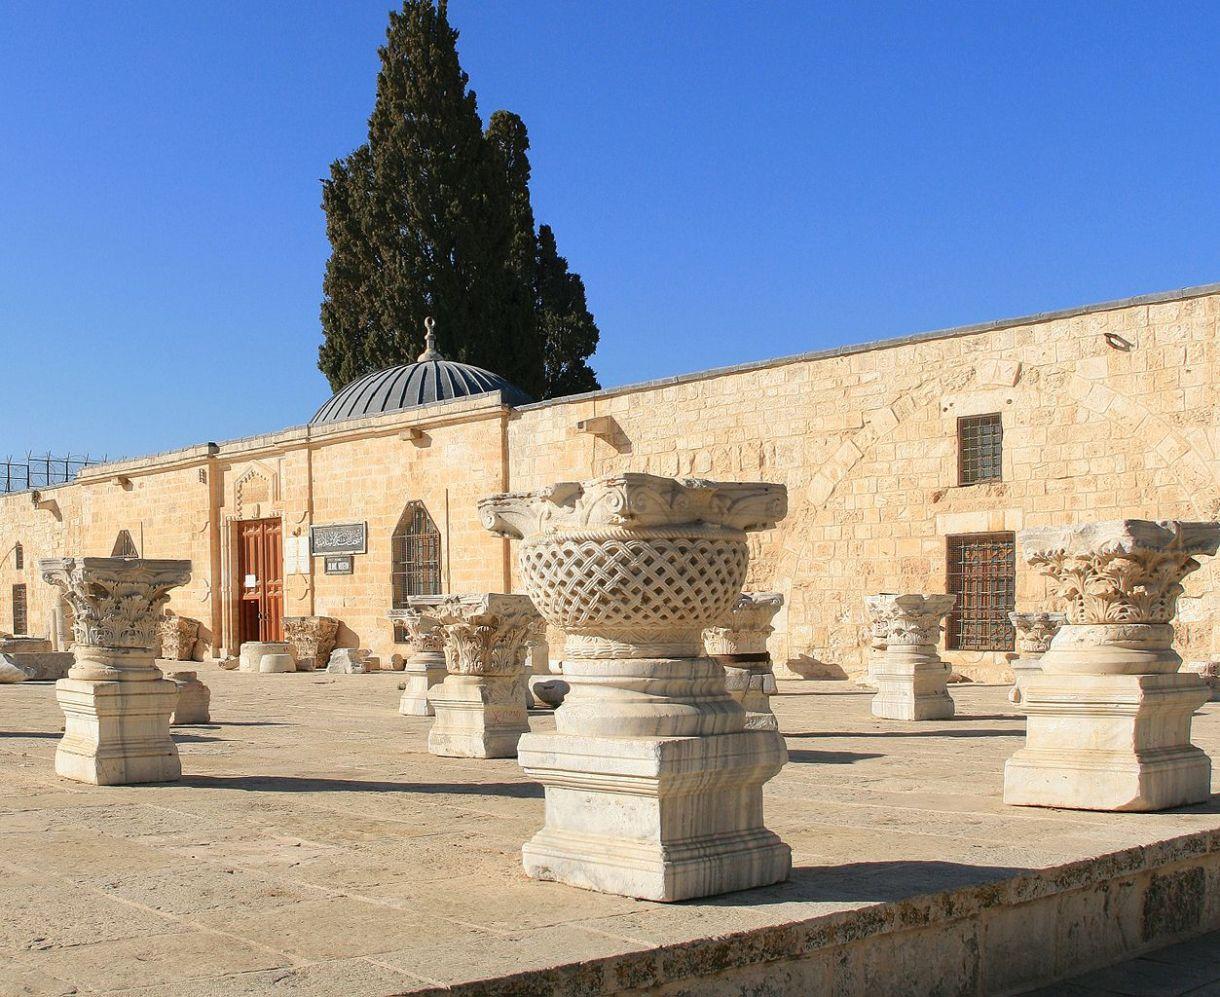 The Islamic Museum on the Haram al-Sharif/Temple Mount compound, East Jerusalem. (Ludvig14/Wikimedia Commons)